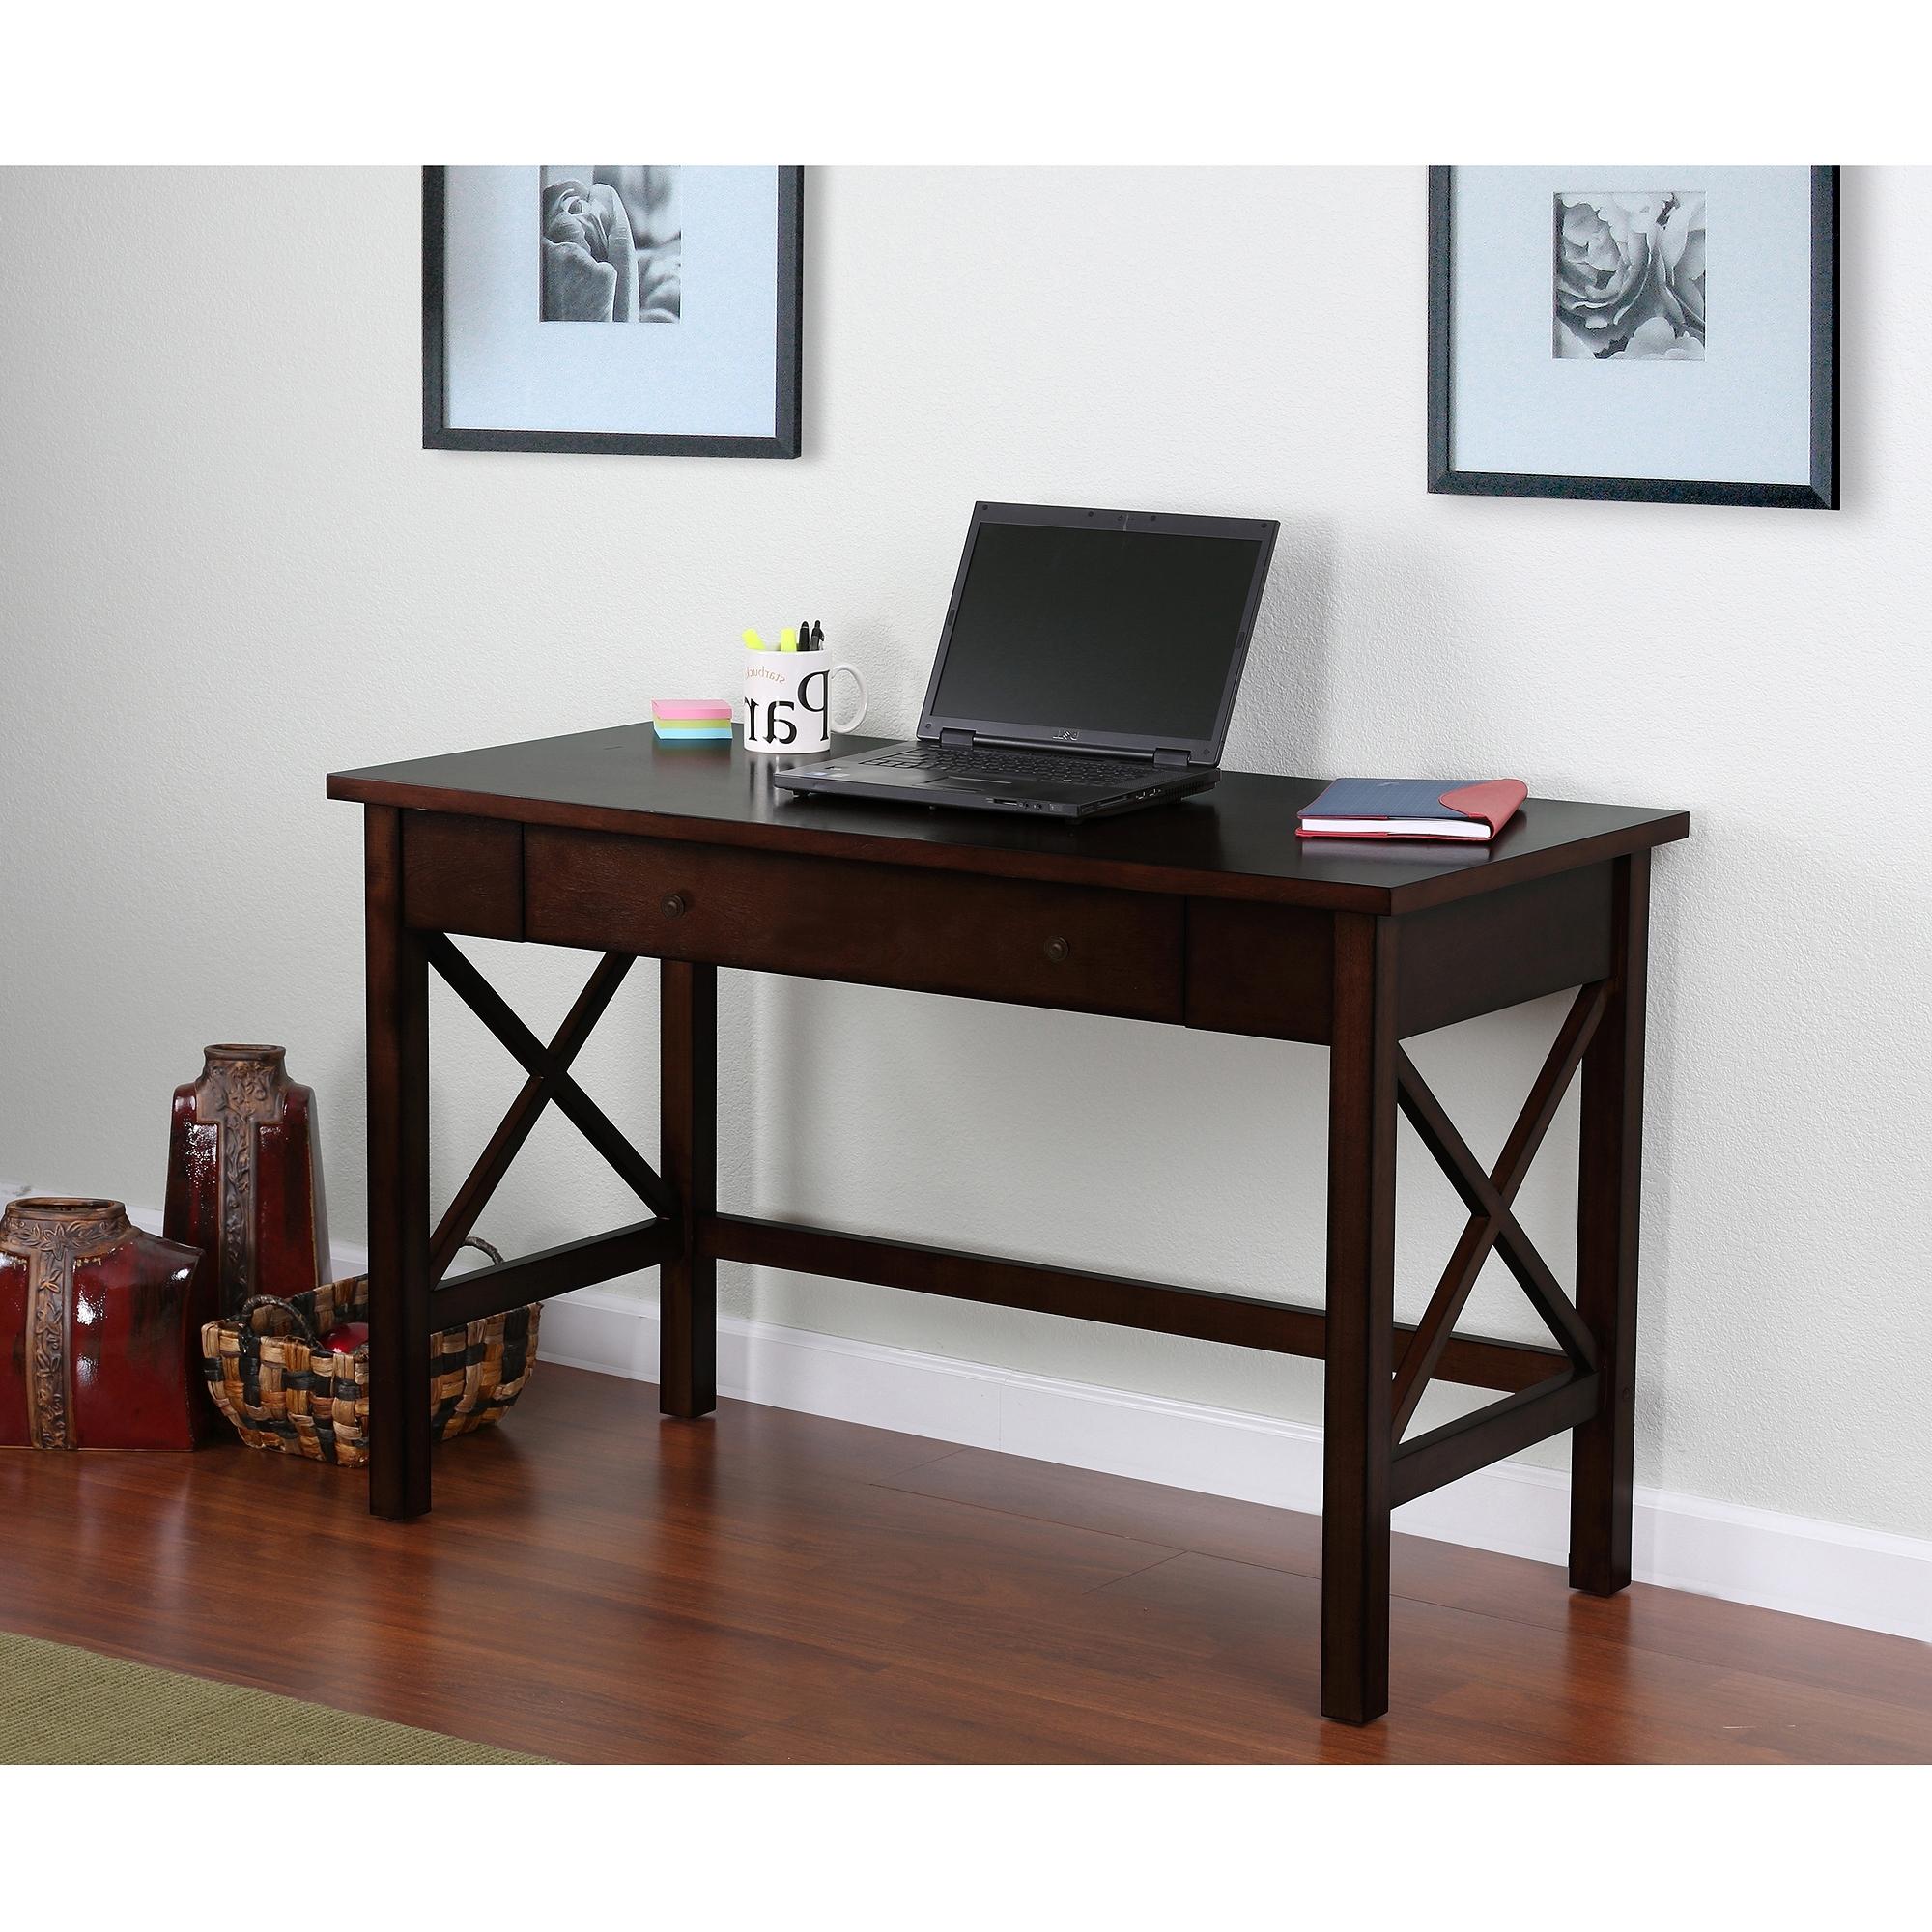 Computer Desks At Walmart Throughout Famous Ashmore Desk – Walmart (View 9 of 20)